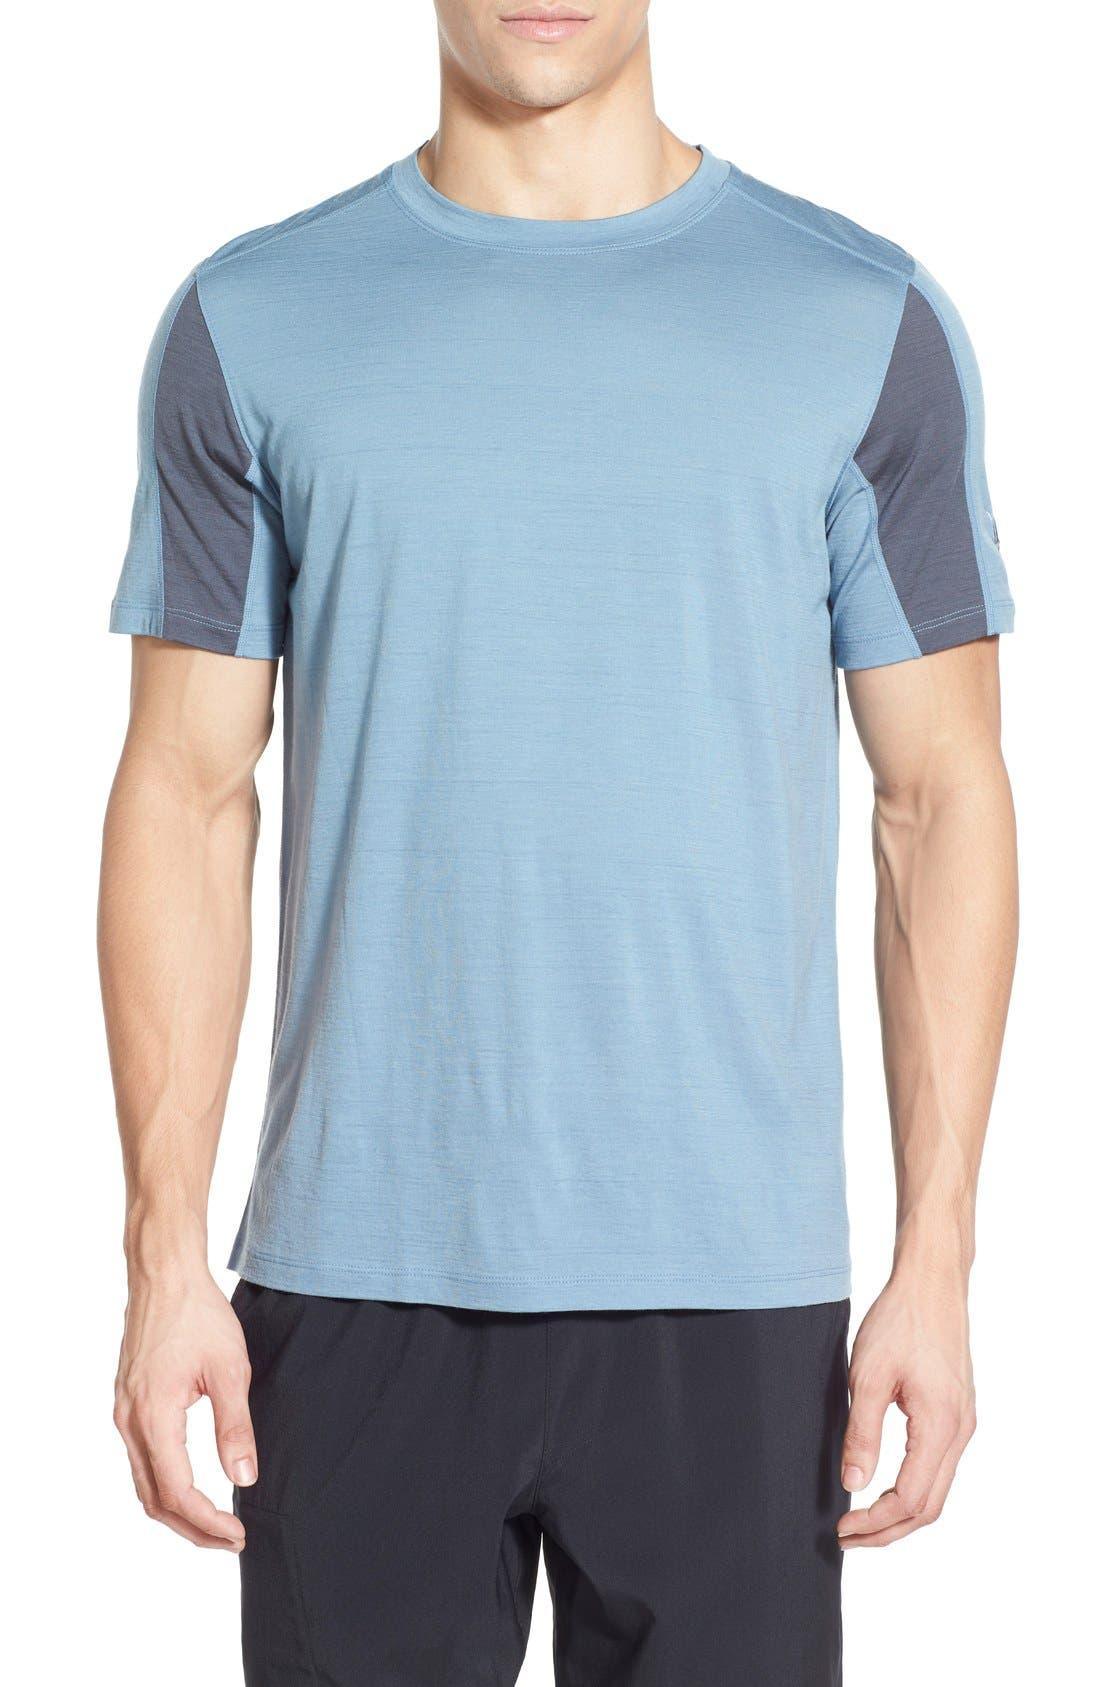 IBEX 'W2 Sport' Merino Wool Jersey T-Shirt